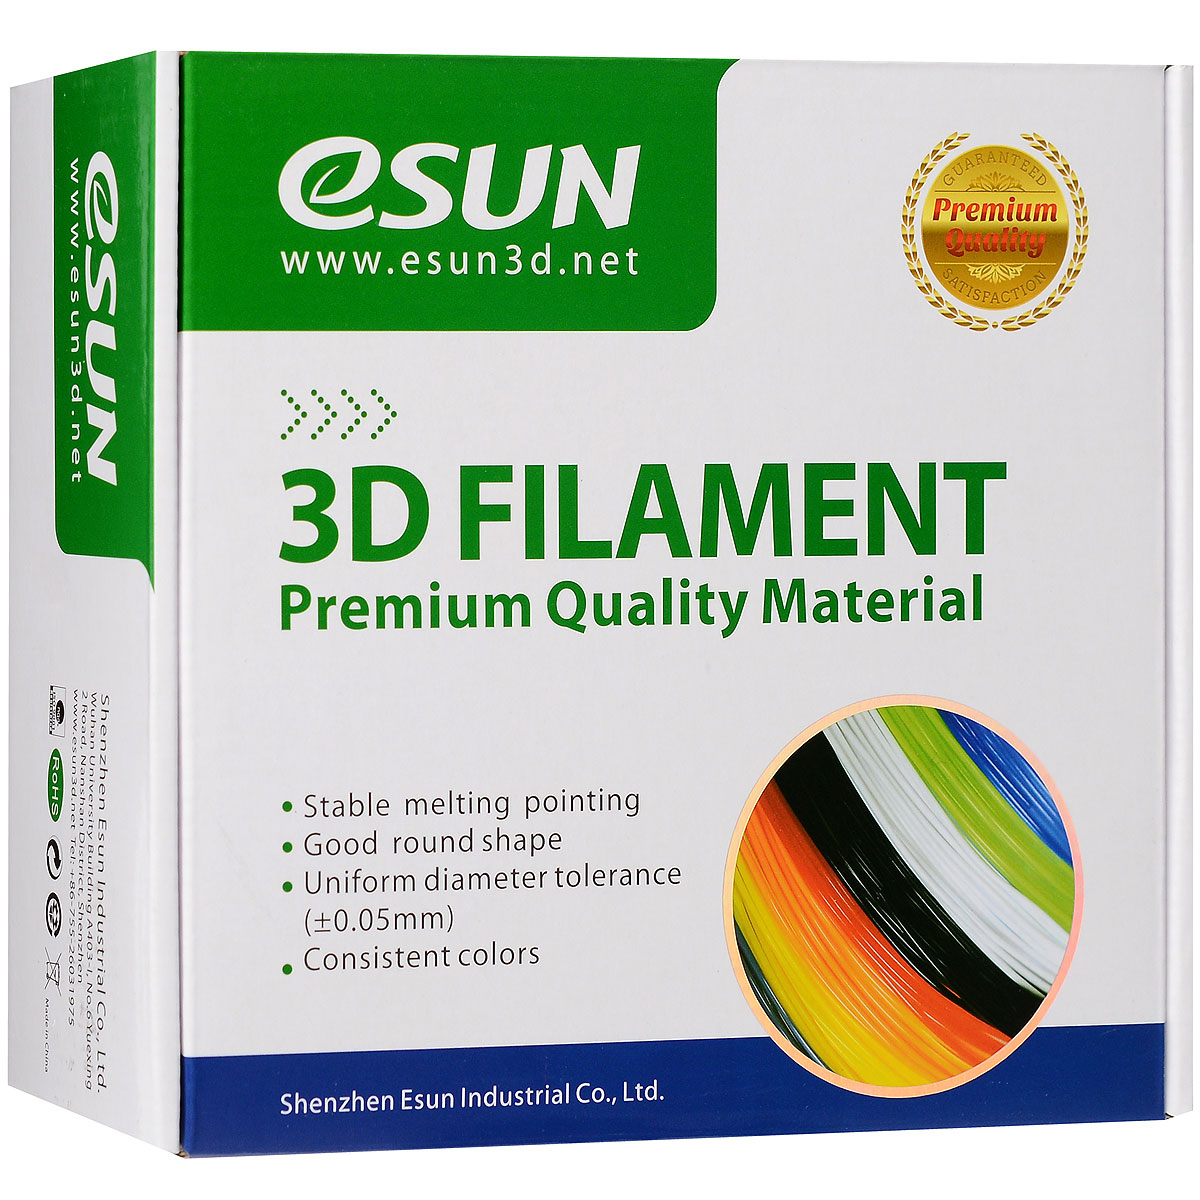 ESUN пластик PLA в катушке, Green, 1,75 мм - Расходные материалы